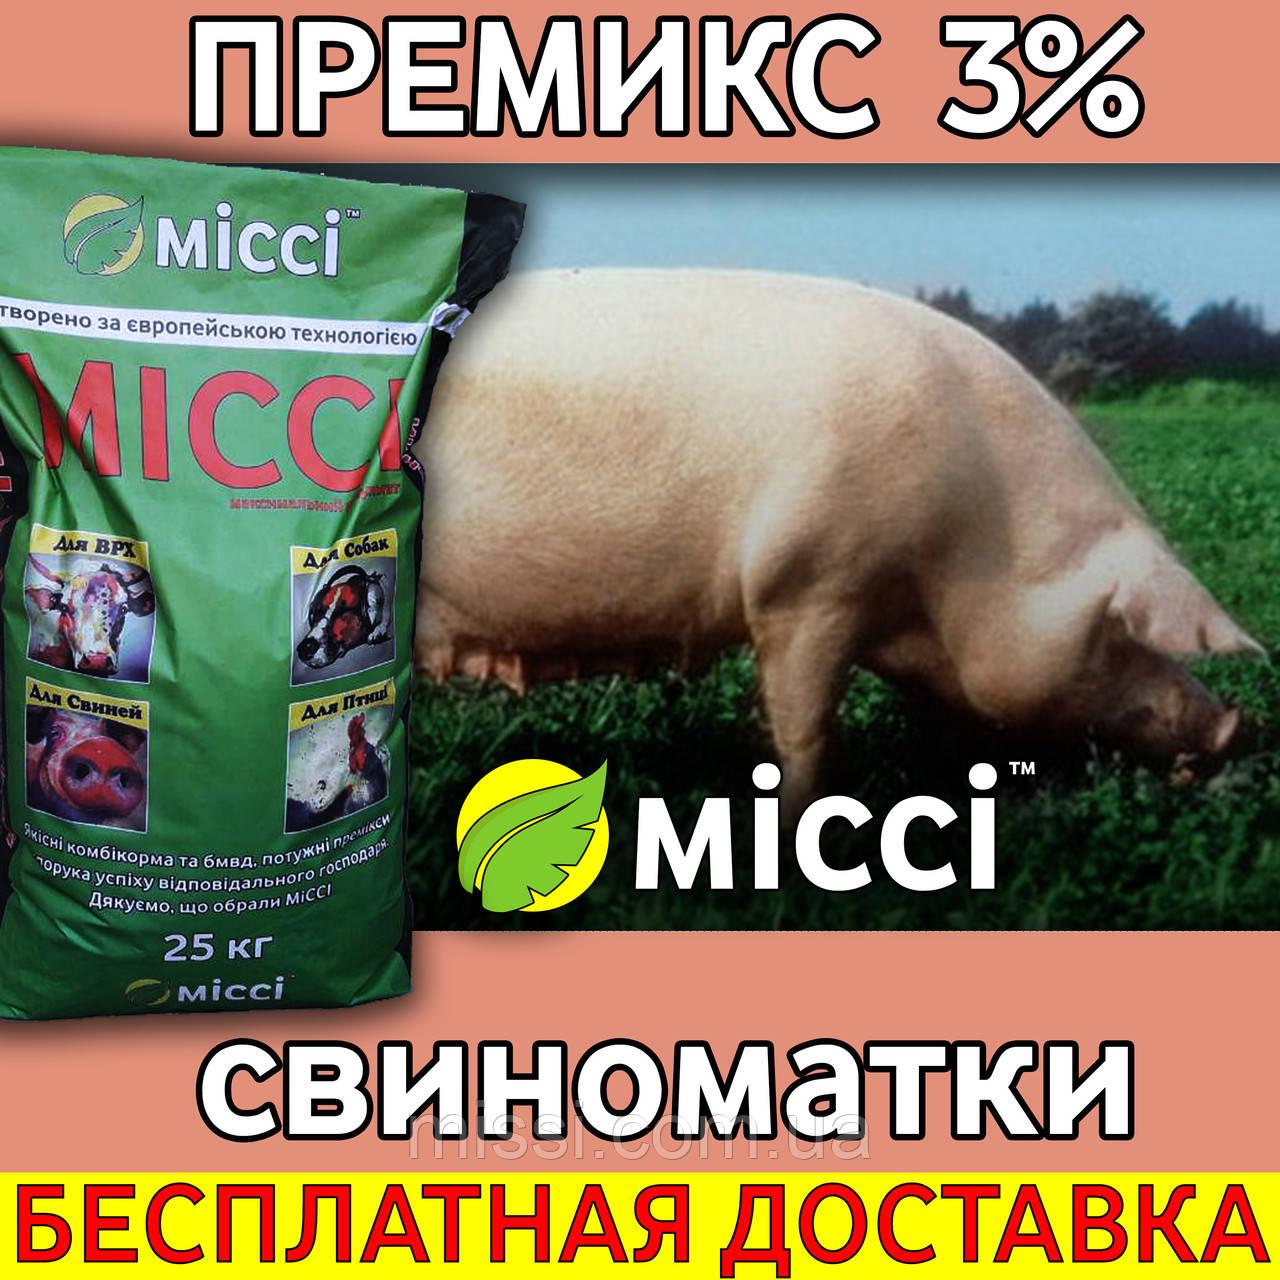 ПРЕМИКС для СВИНОМАТОК 3% (мешок 25 кг), Мисси